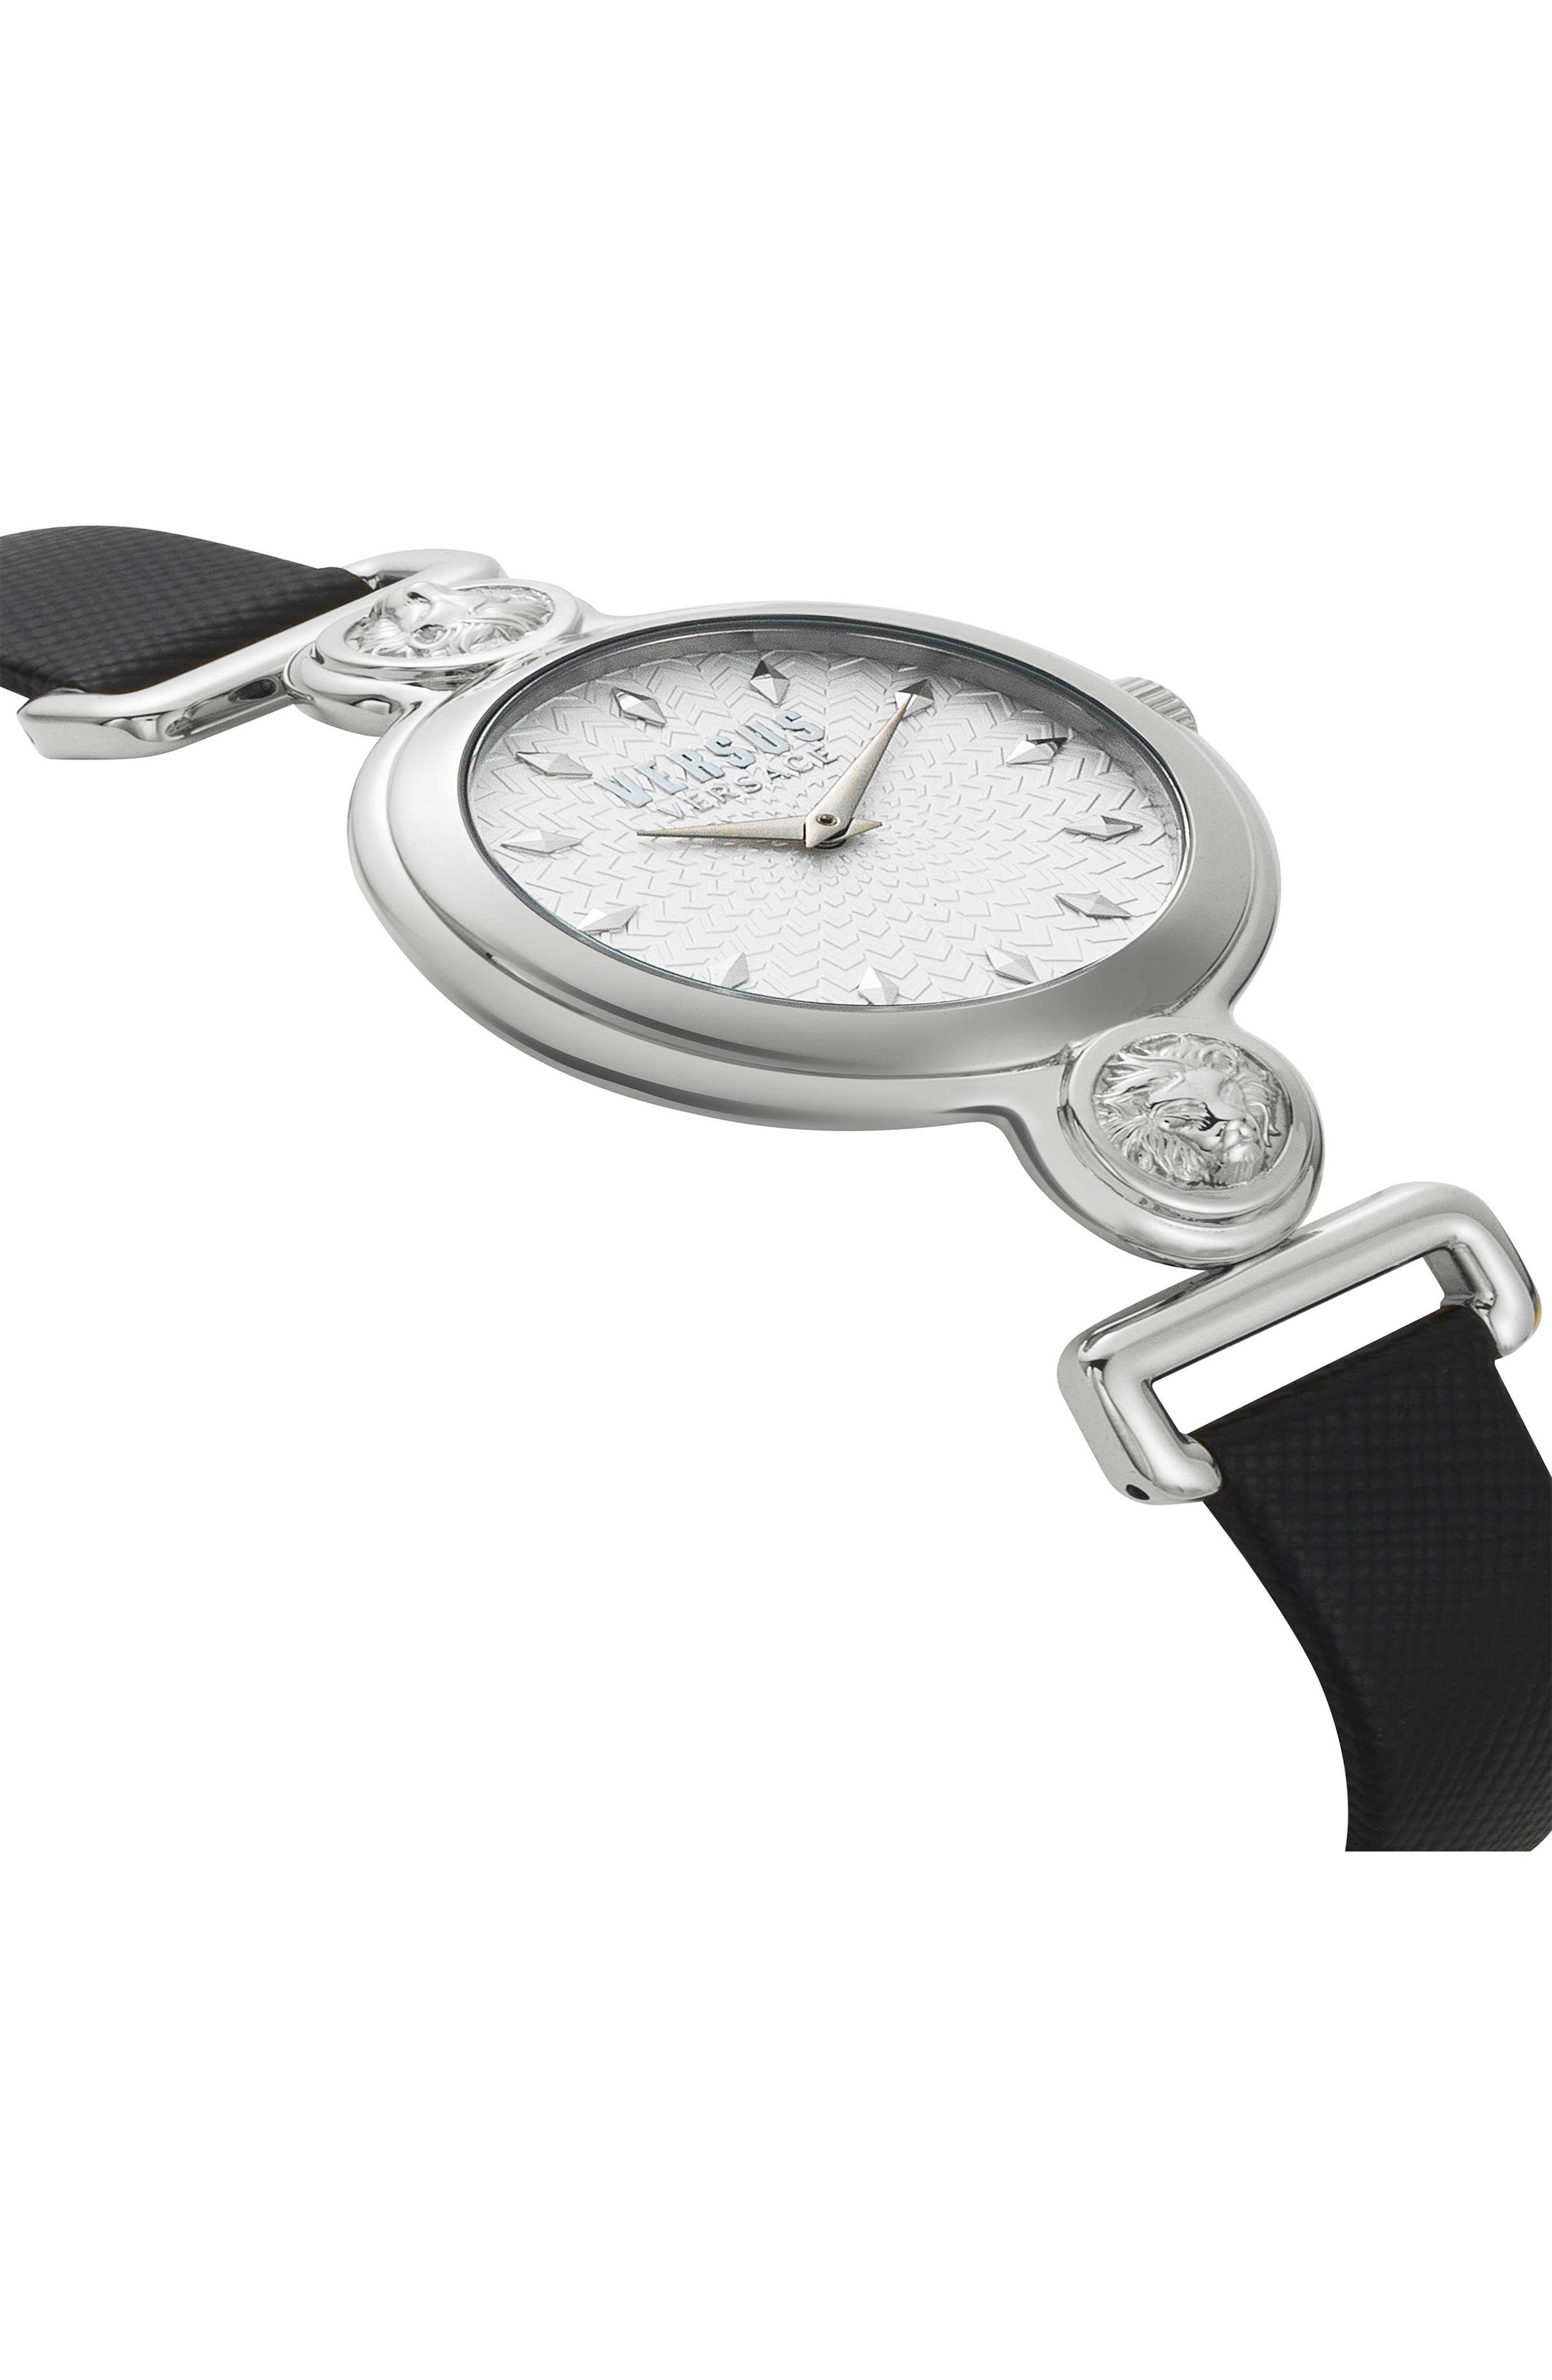 VERSUS by Versace Sunnyridge Leather Strap Watch, 34mm,                             Alternate thumbnail 3, color,                             Black/ Silver